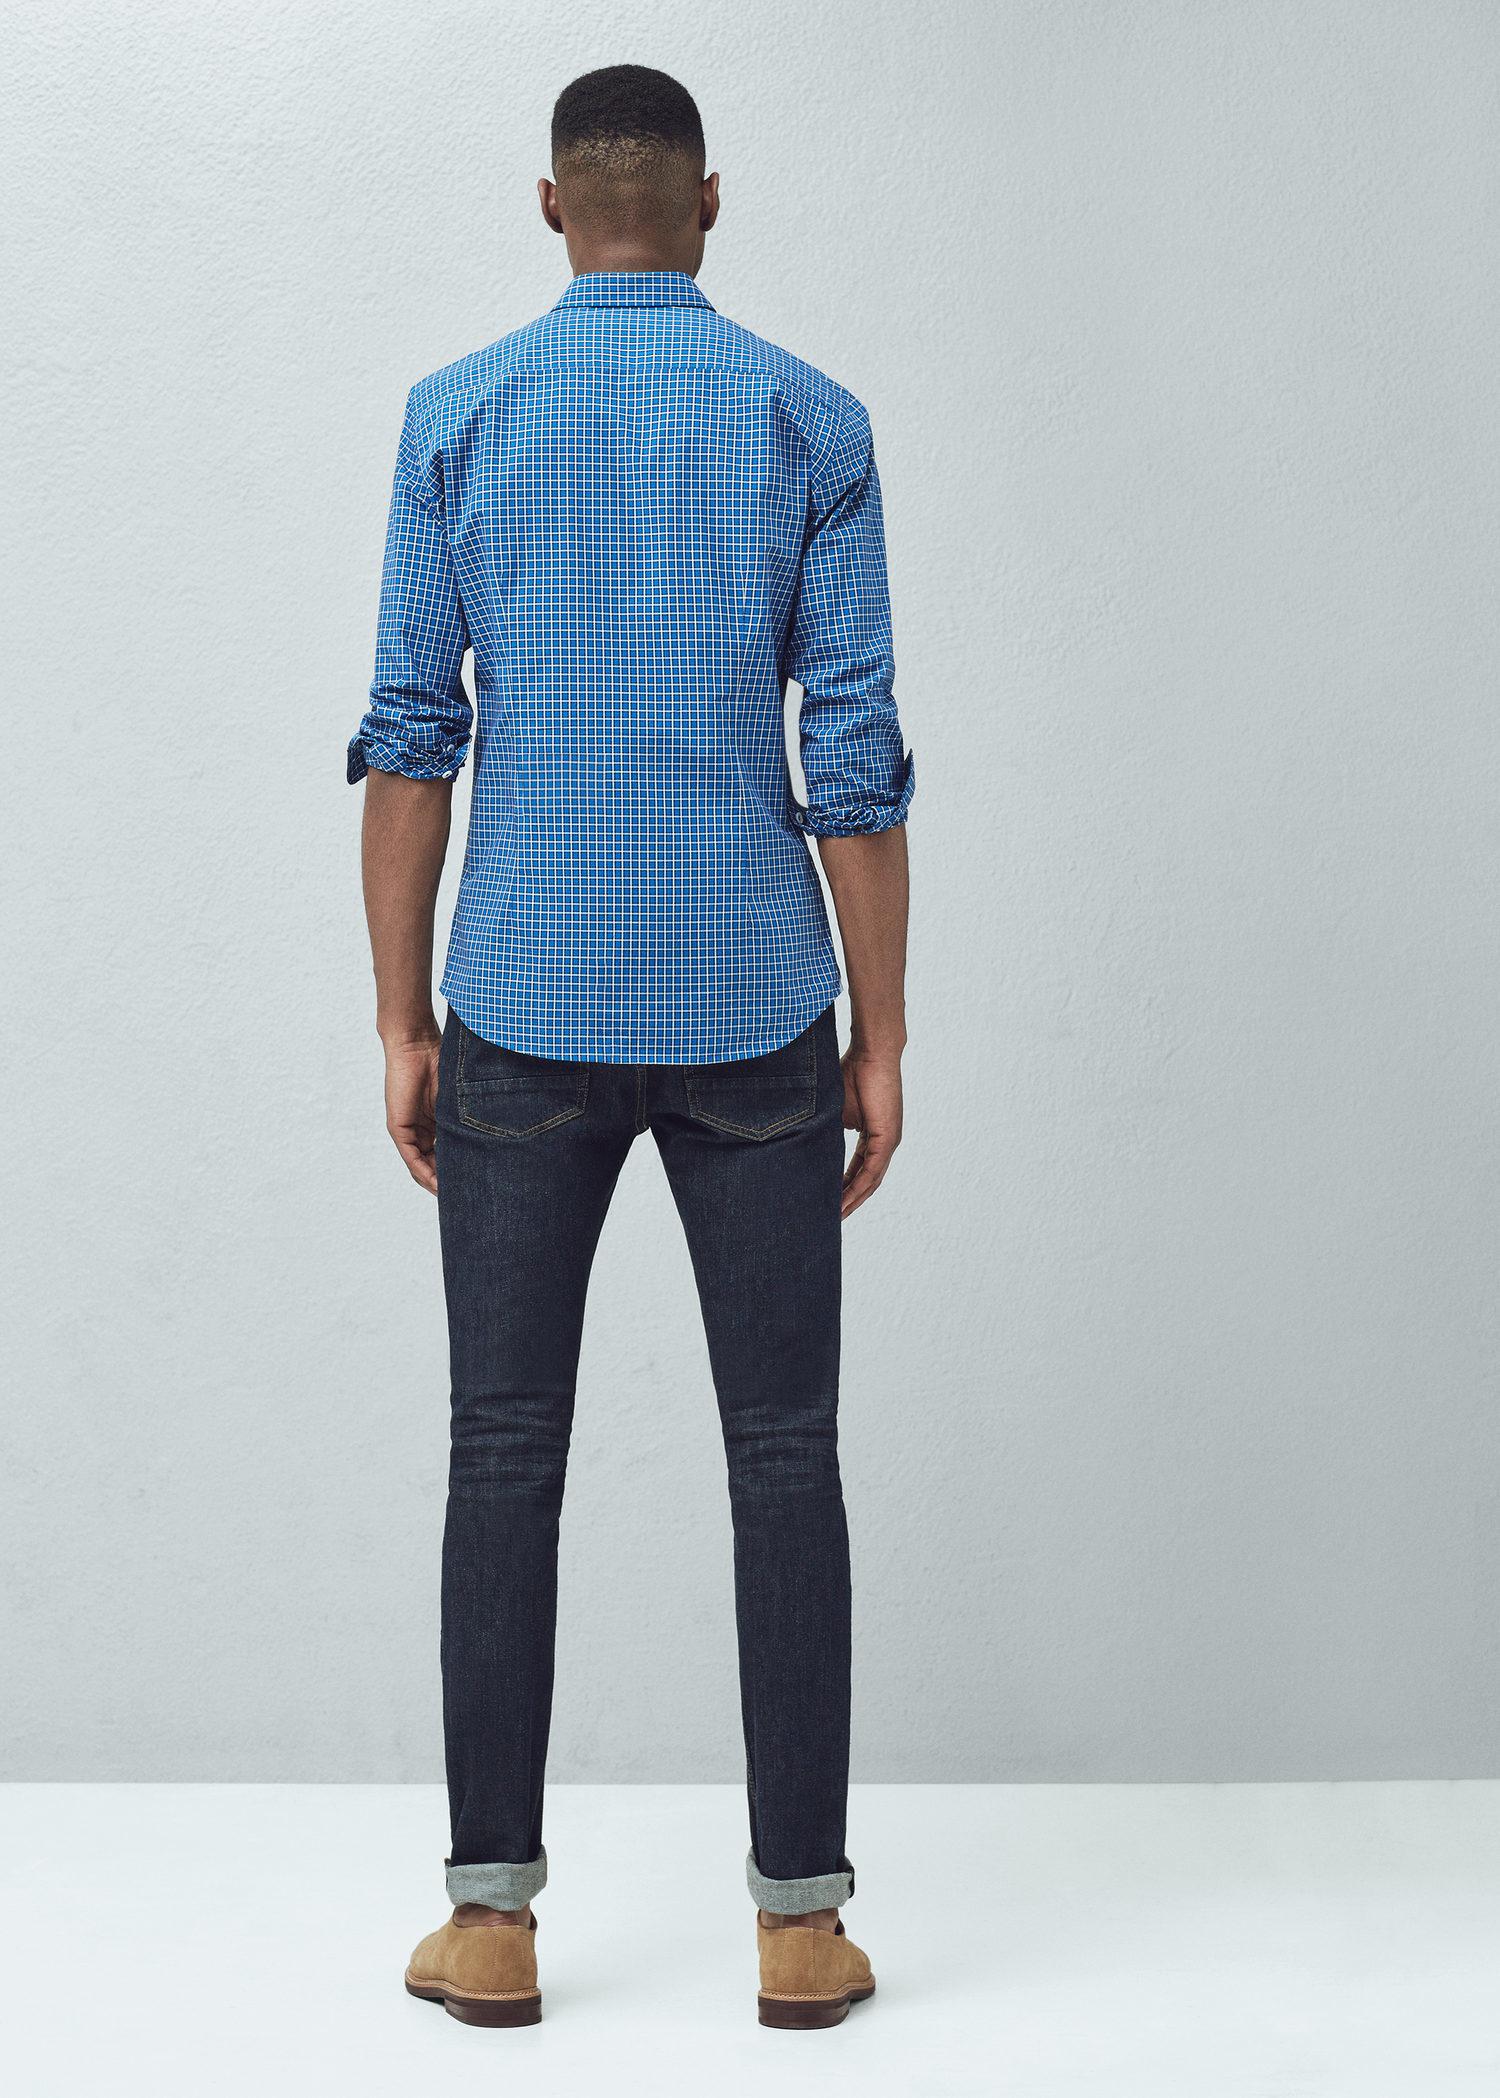 Mango Slim Fit Gingham Check Shirt In Blue For Men Lyst